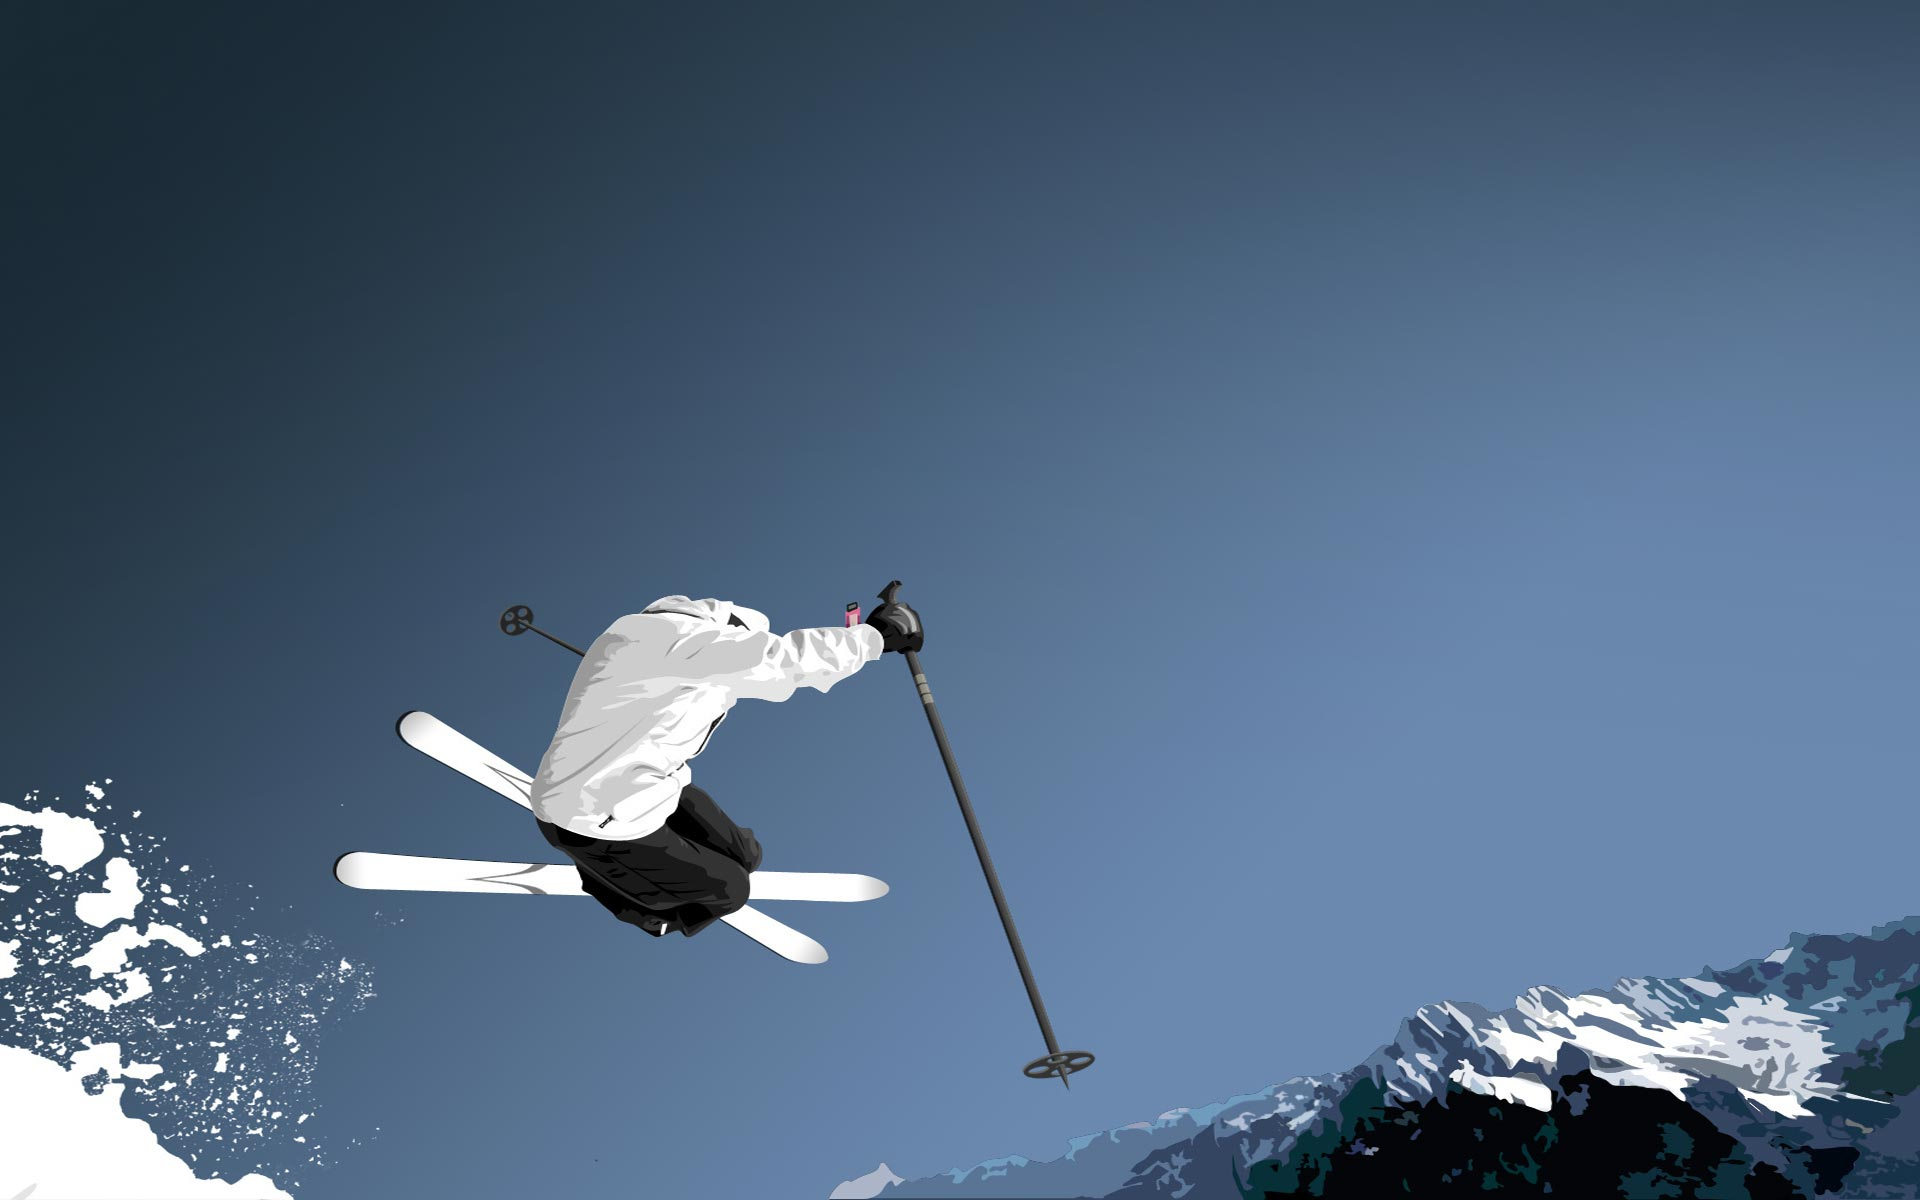 Skiing Sport Wallpaper Iphone: Free Wallpaper Skiing